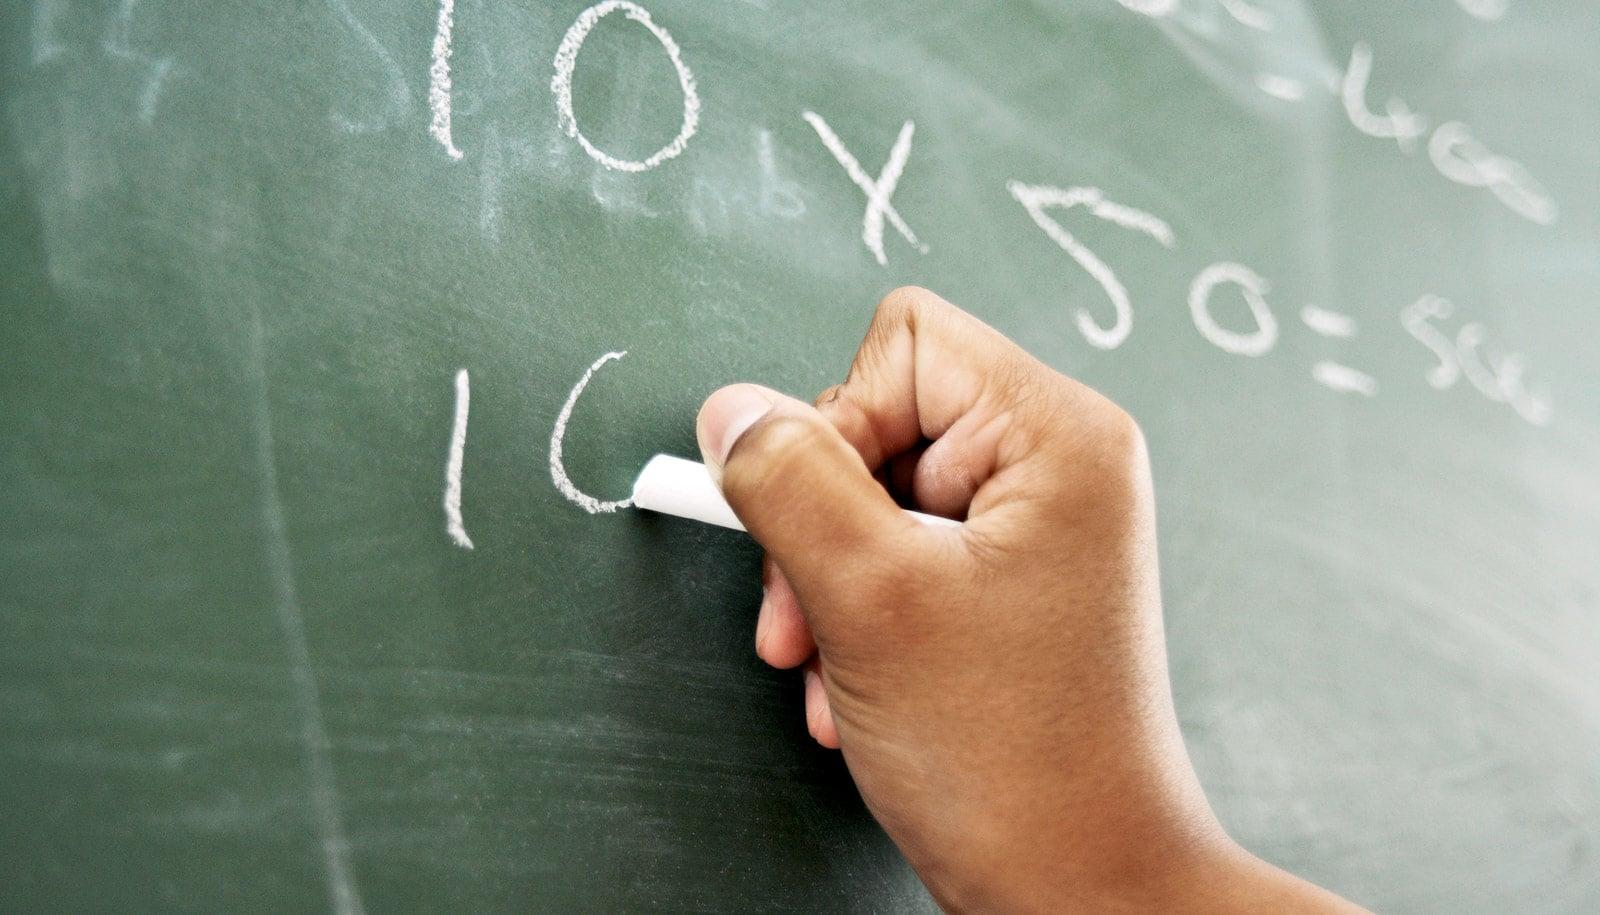 When math teachers change mindset, student grades go up - Futurity